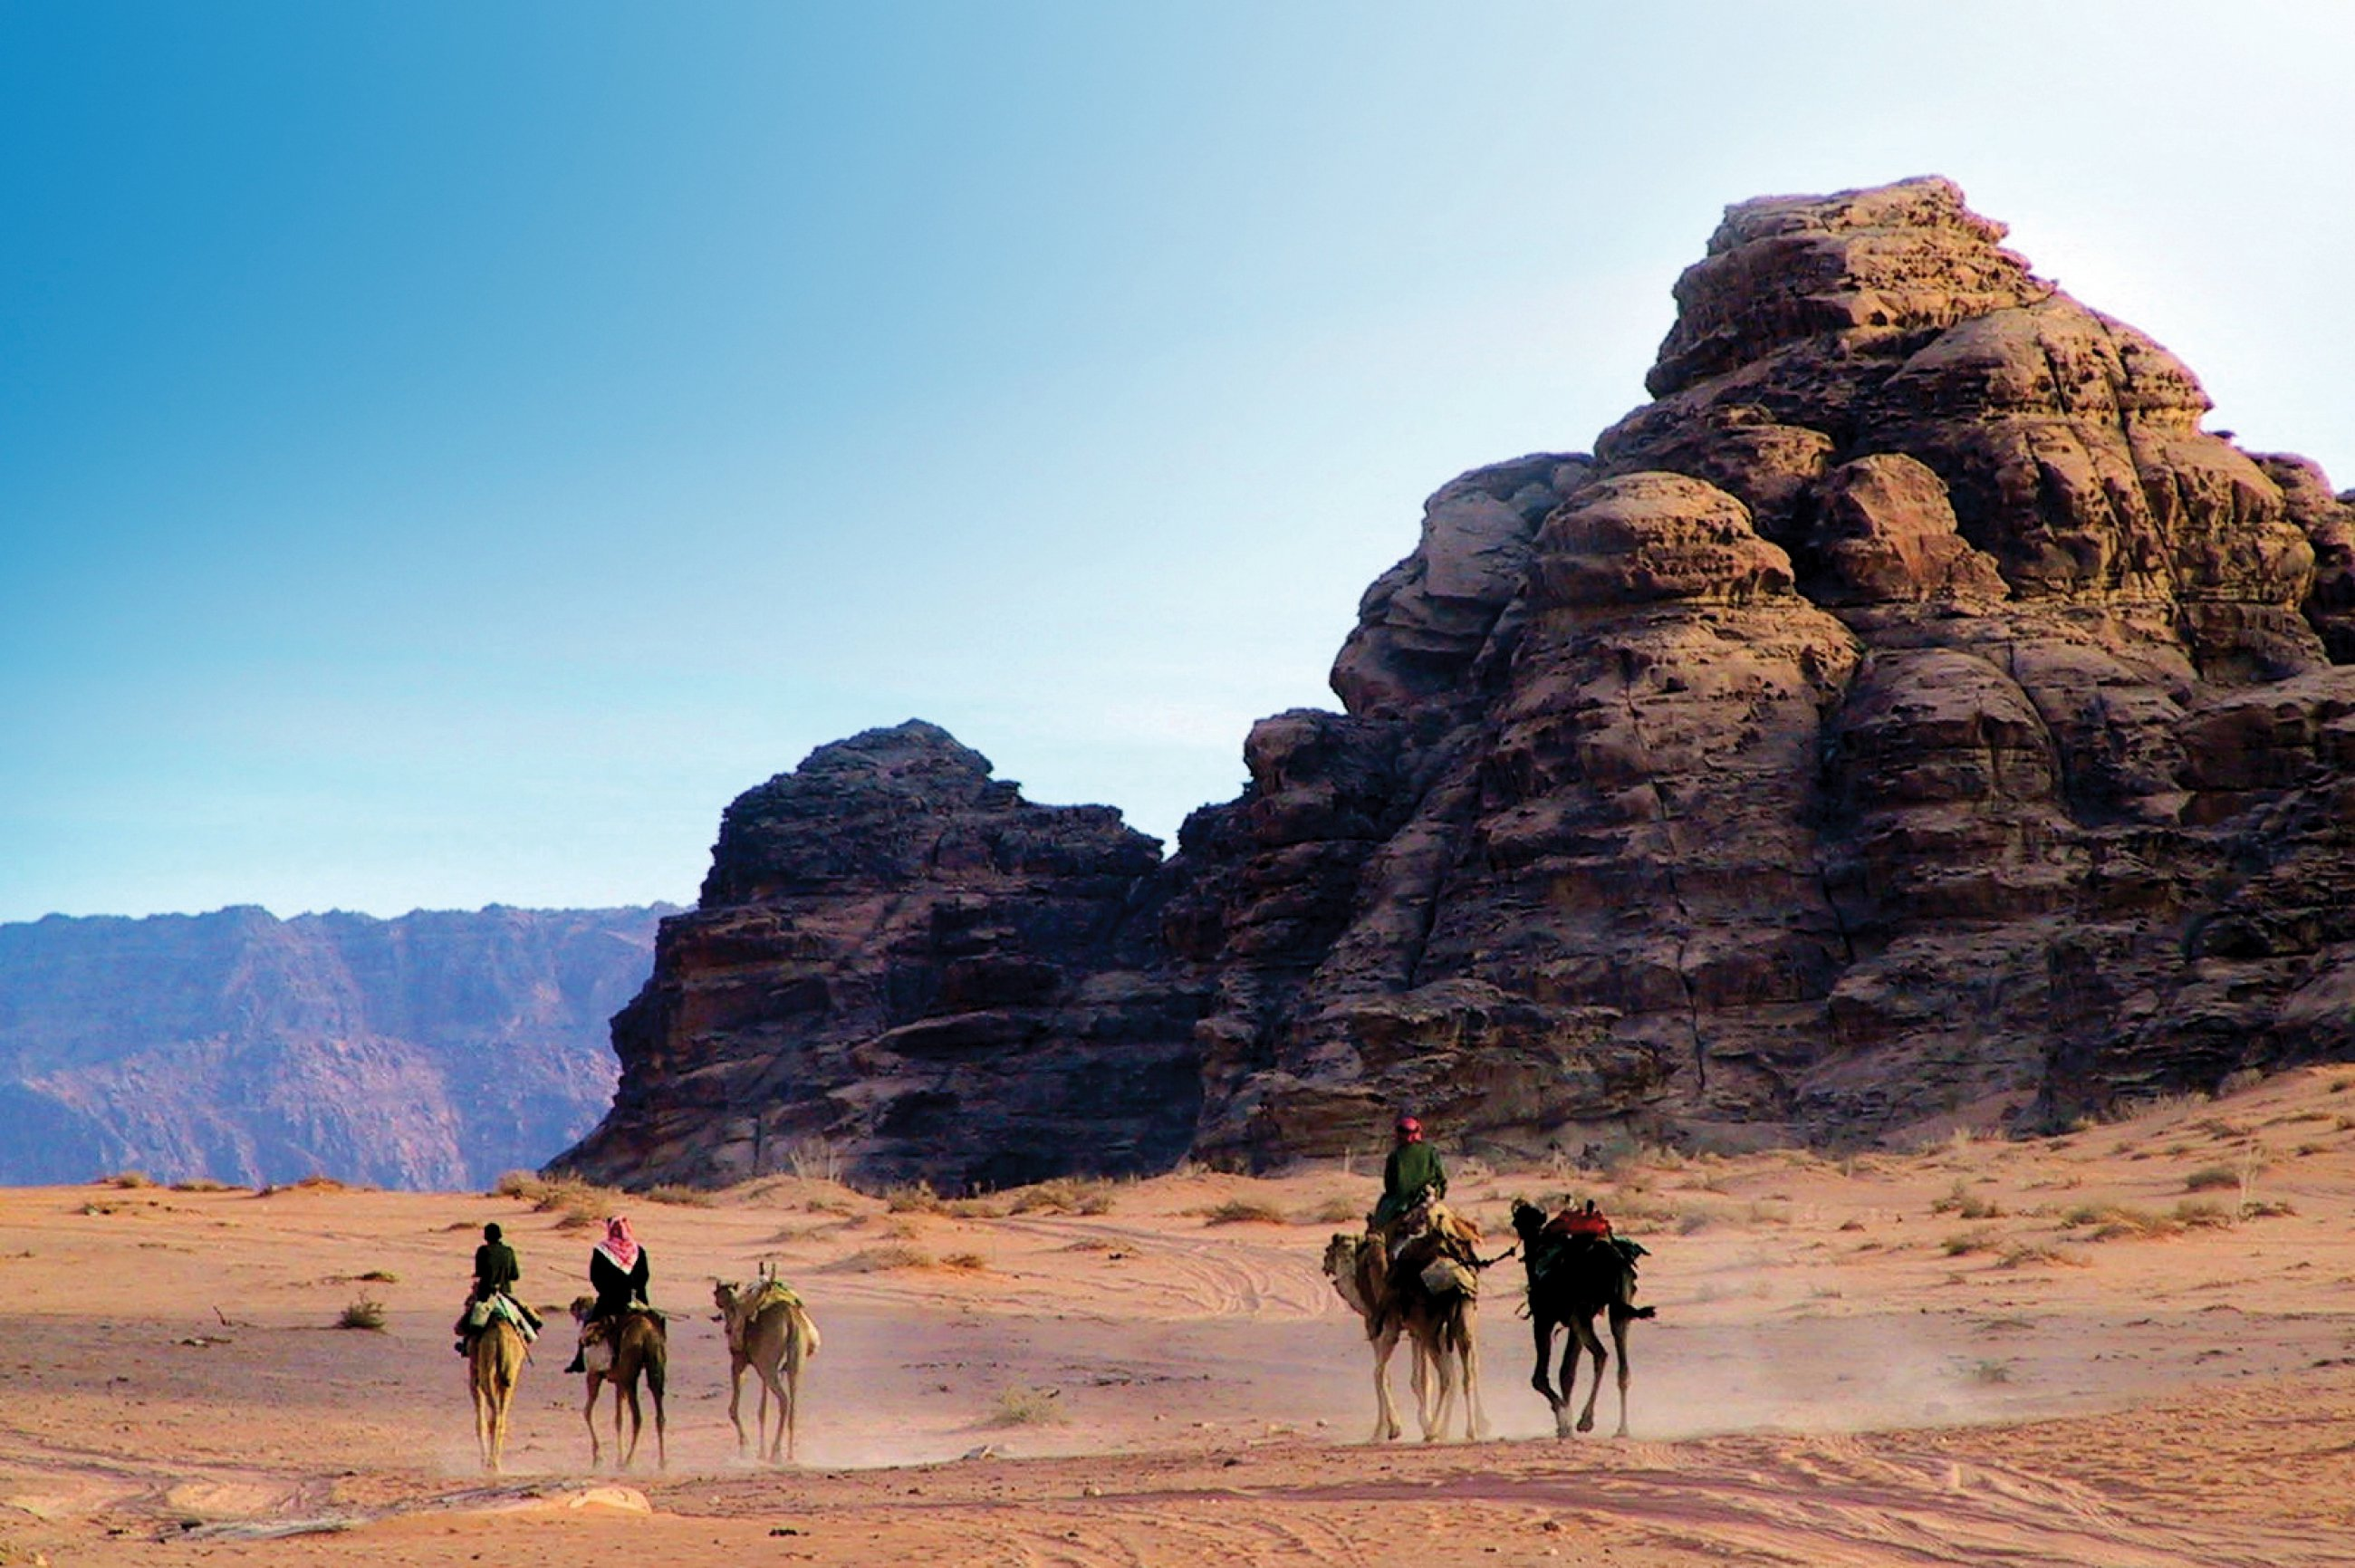 https://bubo.sk/uploads/galleries/4934/jordansko-wadi-rum-jordansko.jpg